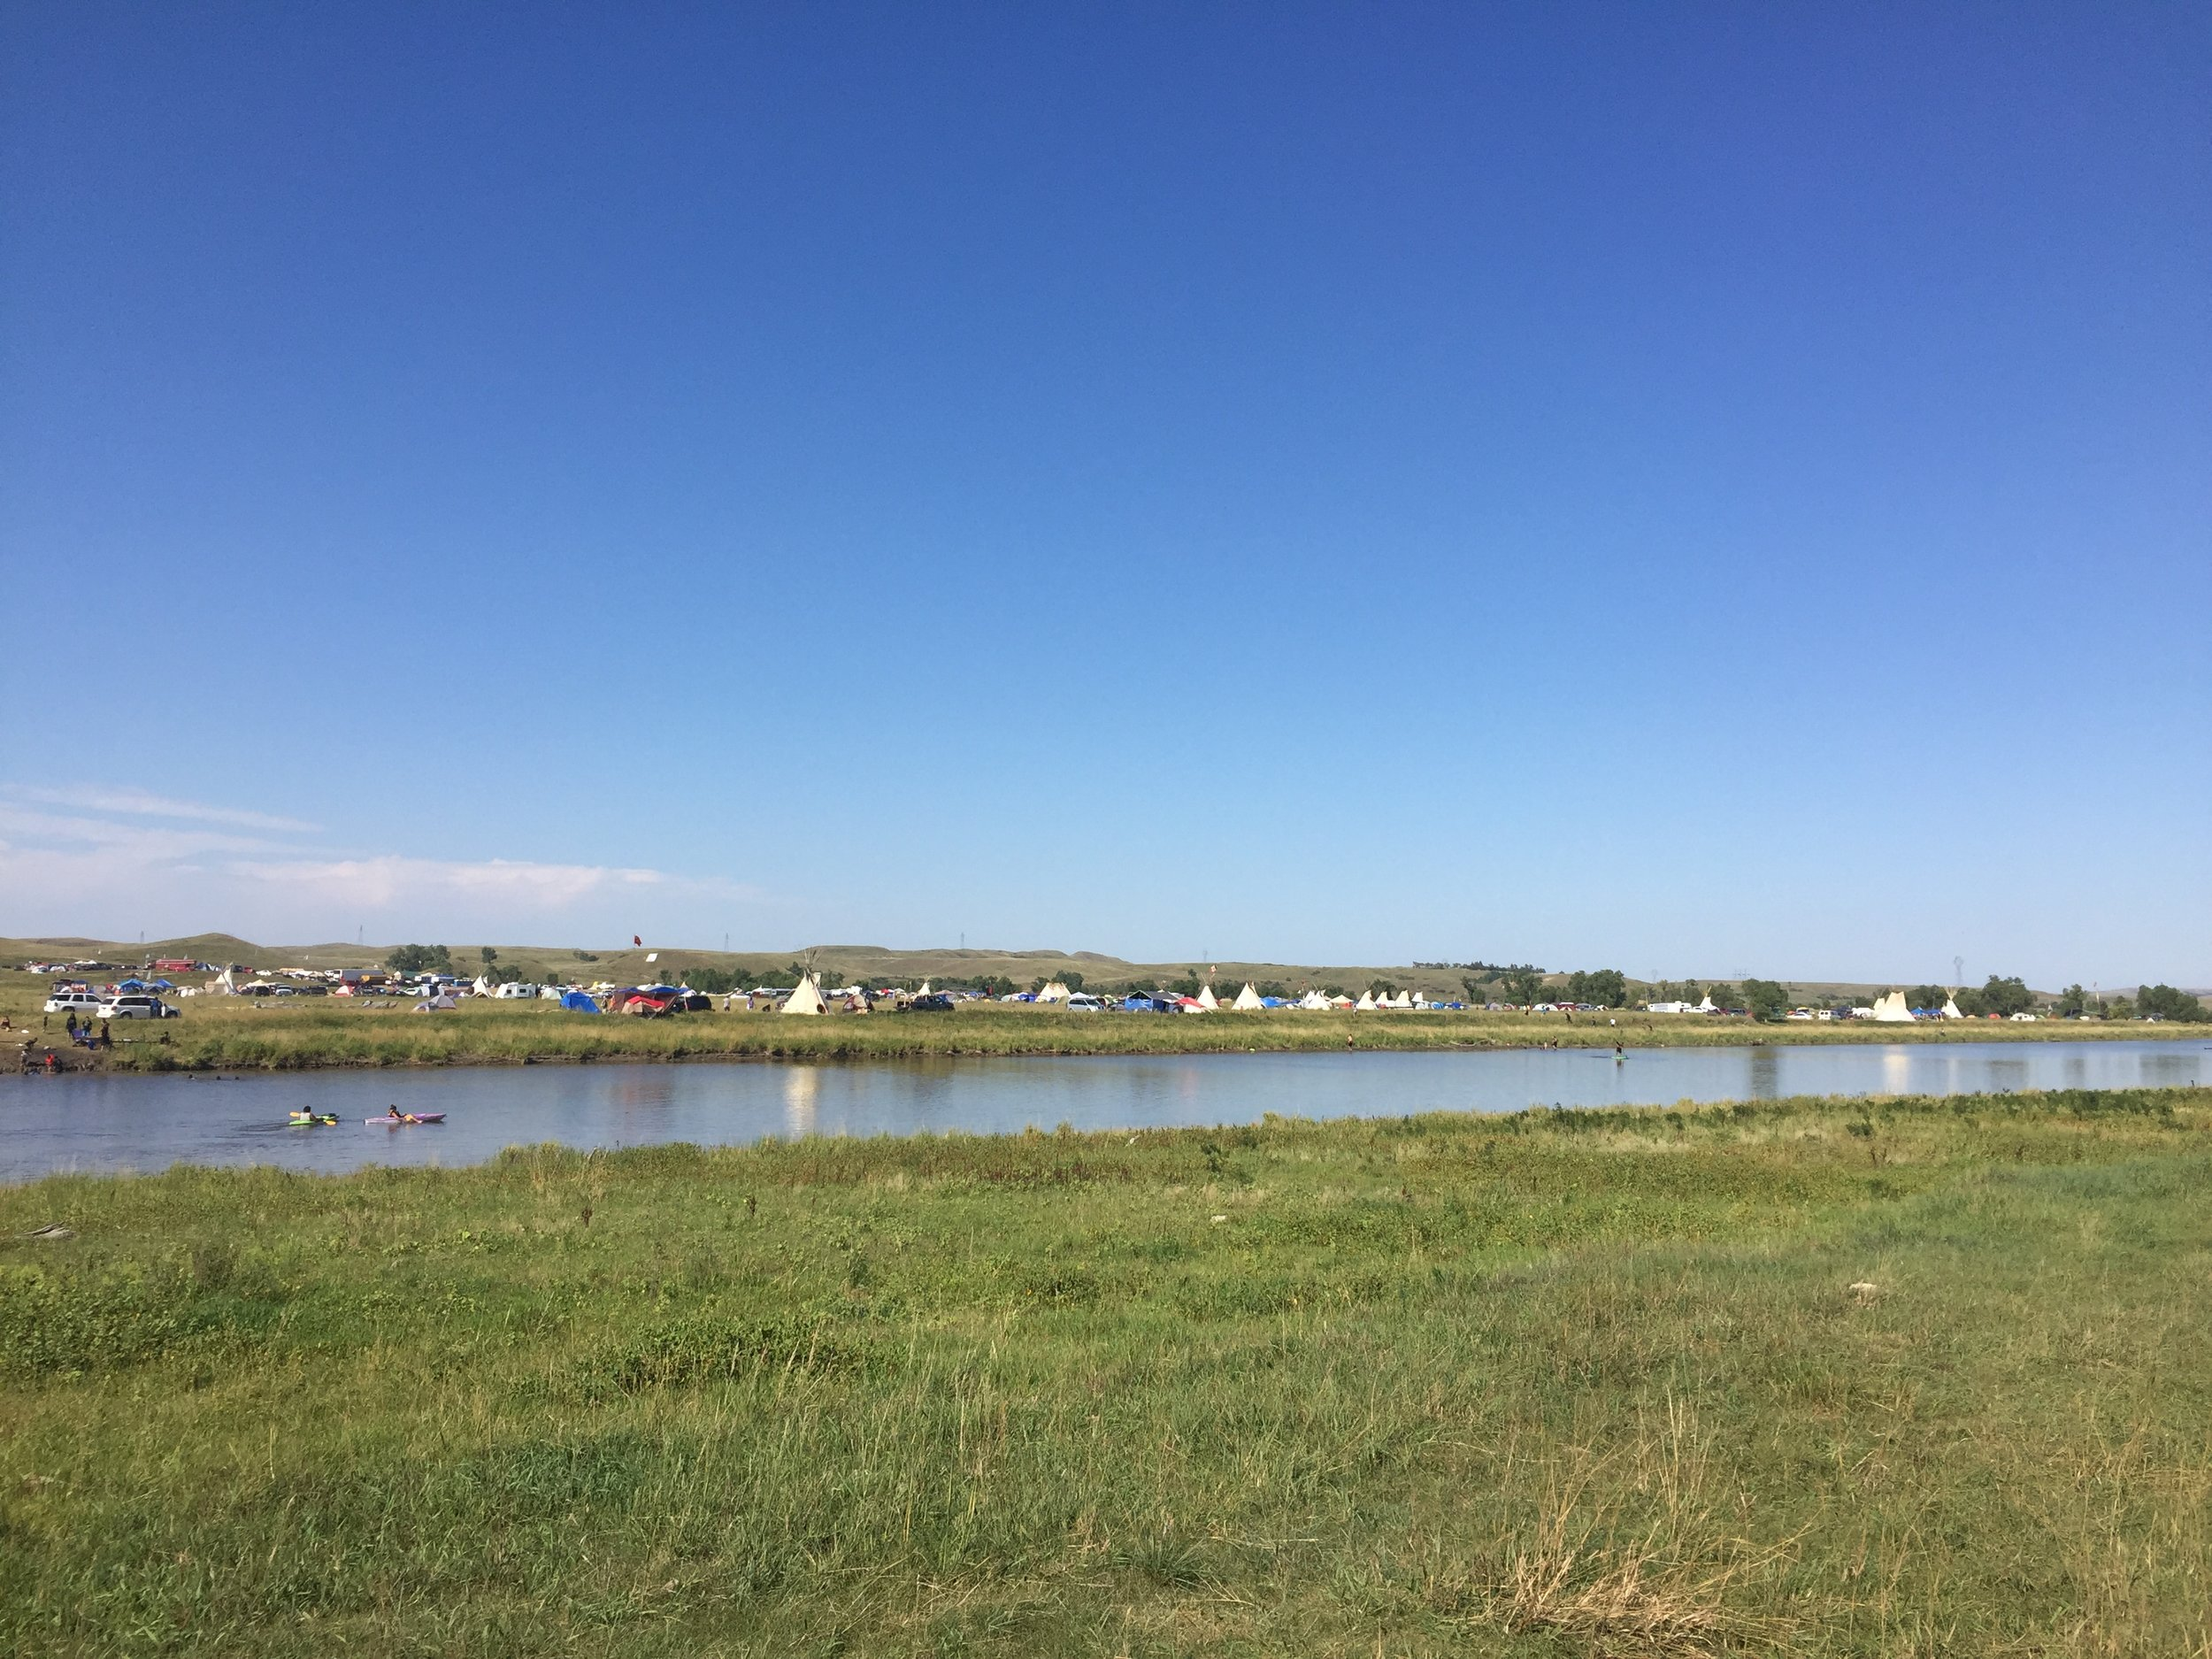 Water protectors camp at Standing Rock, North Dakota. Image capture: August 28th, 2016